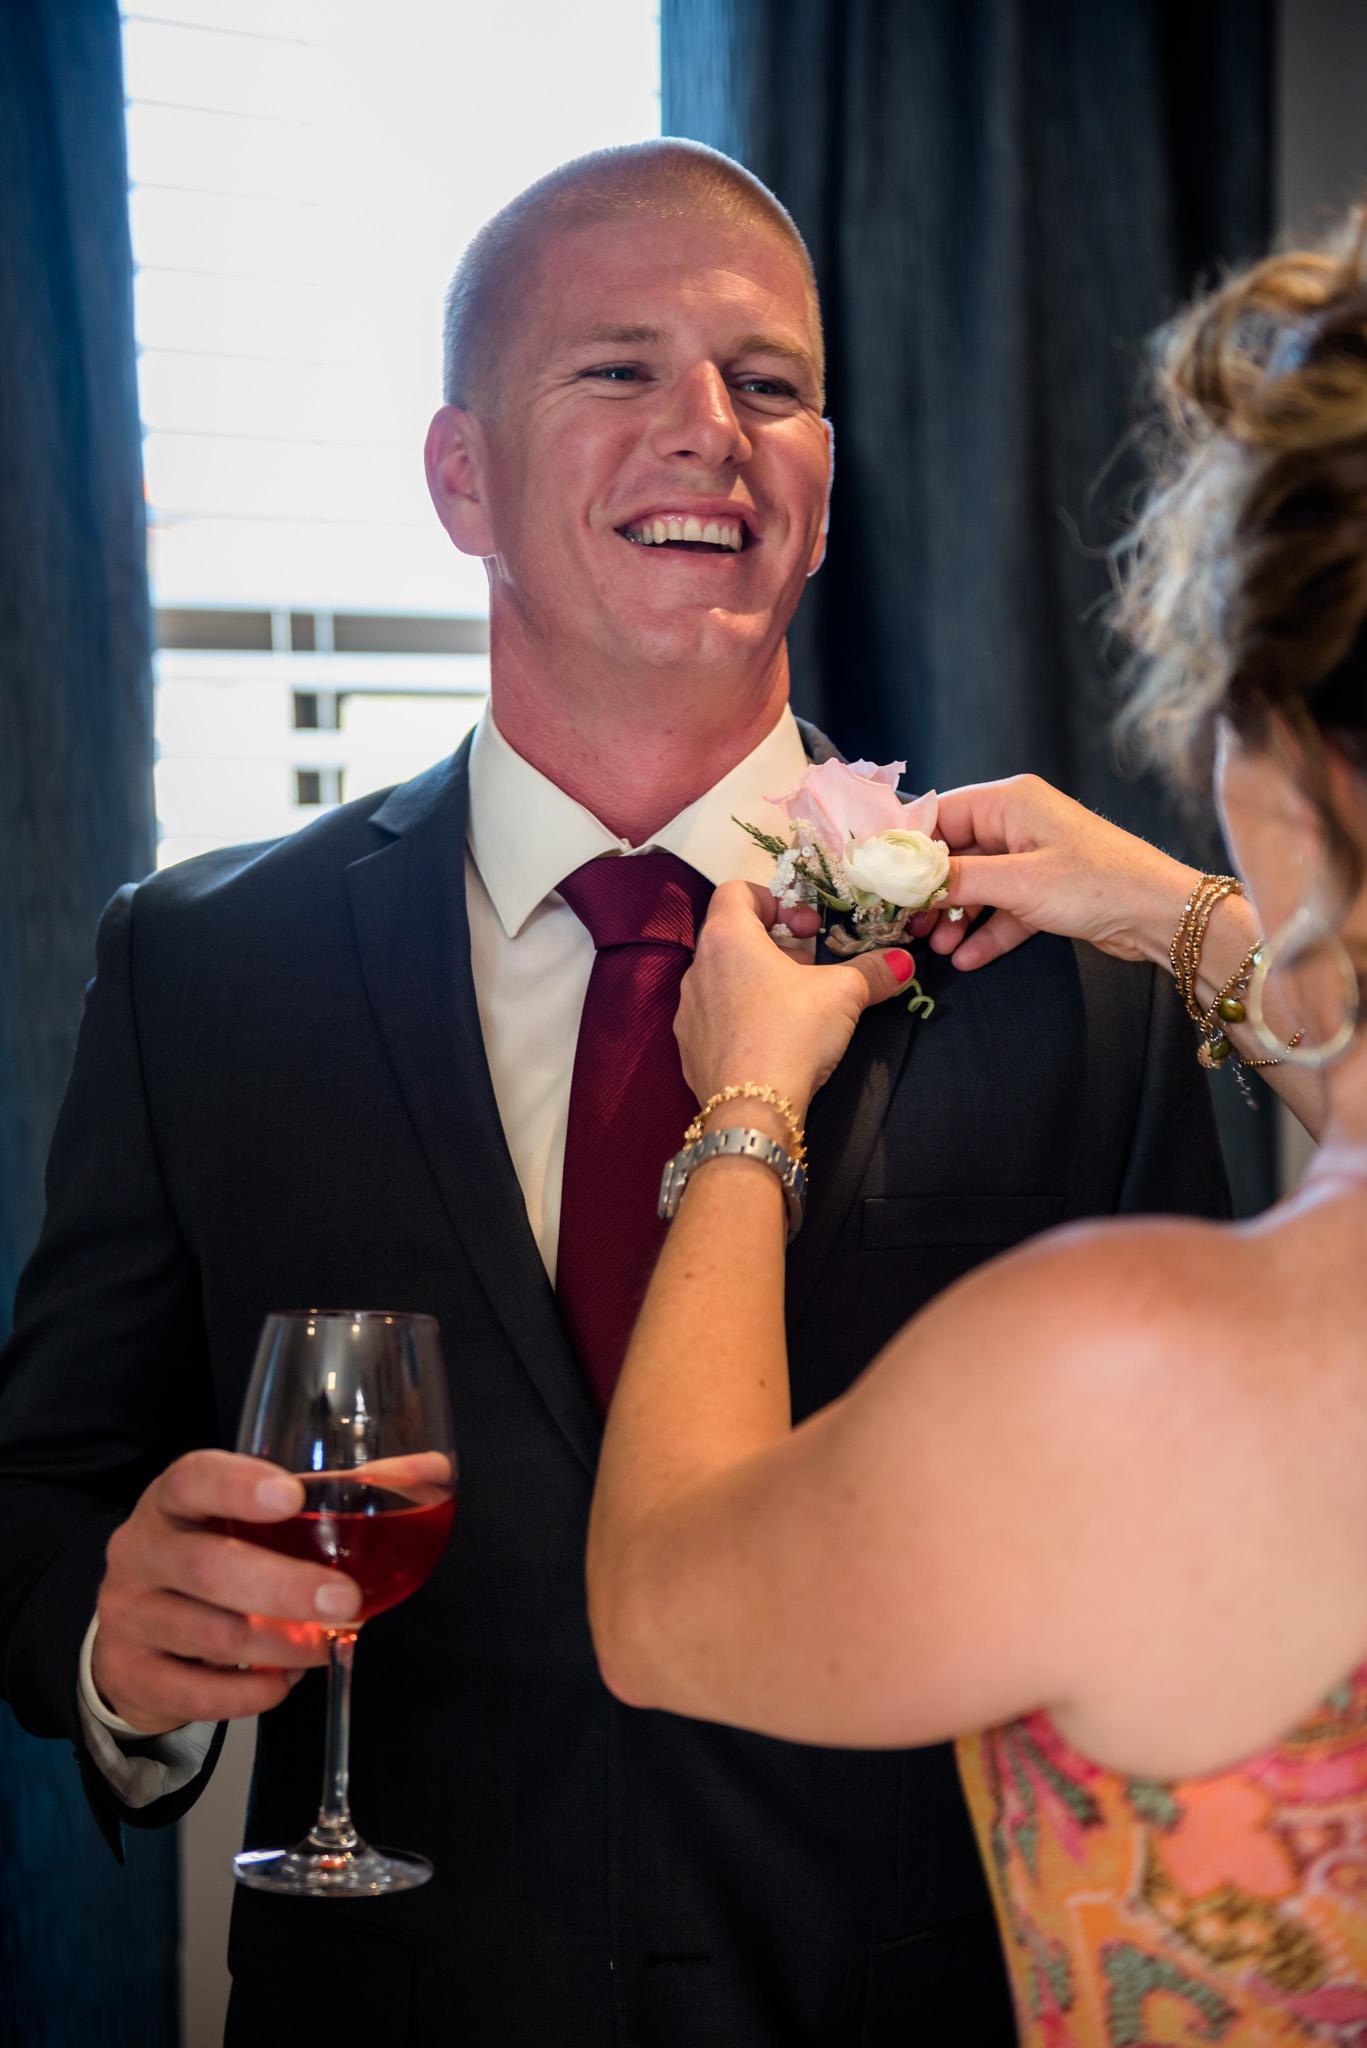 Avensole-Winery-Temecula-Wedding-Josh-and-Olivia-3305.JPG